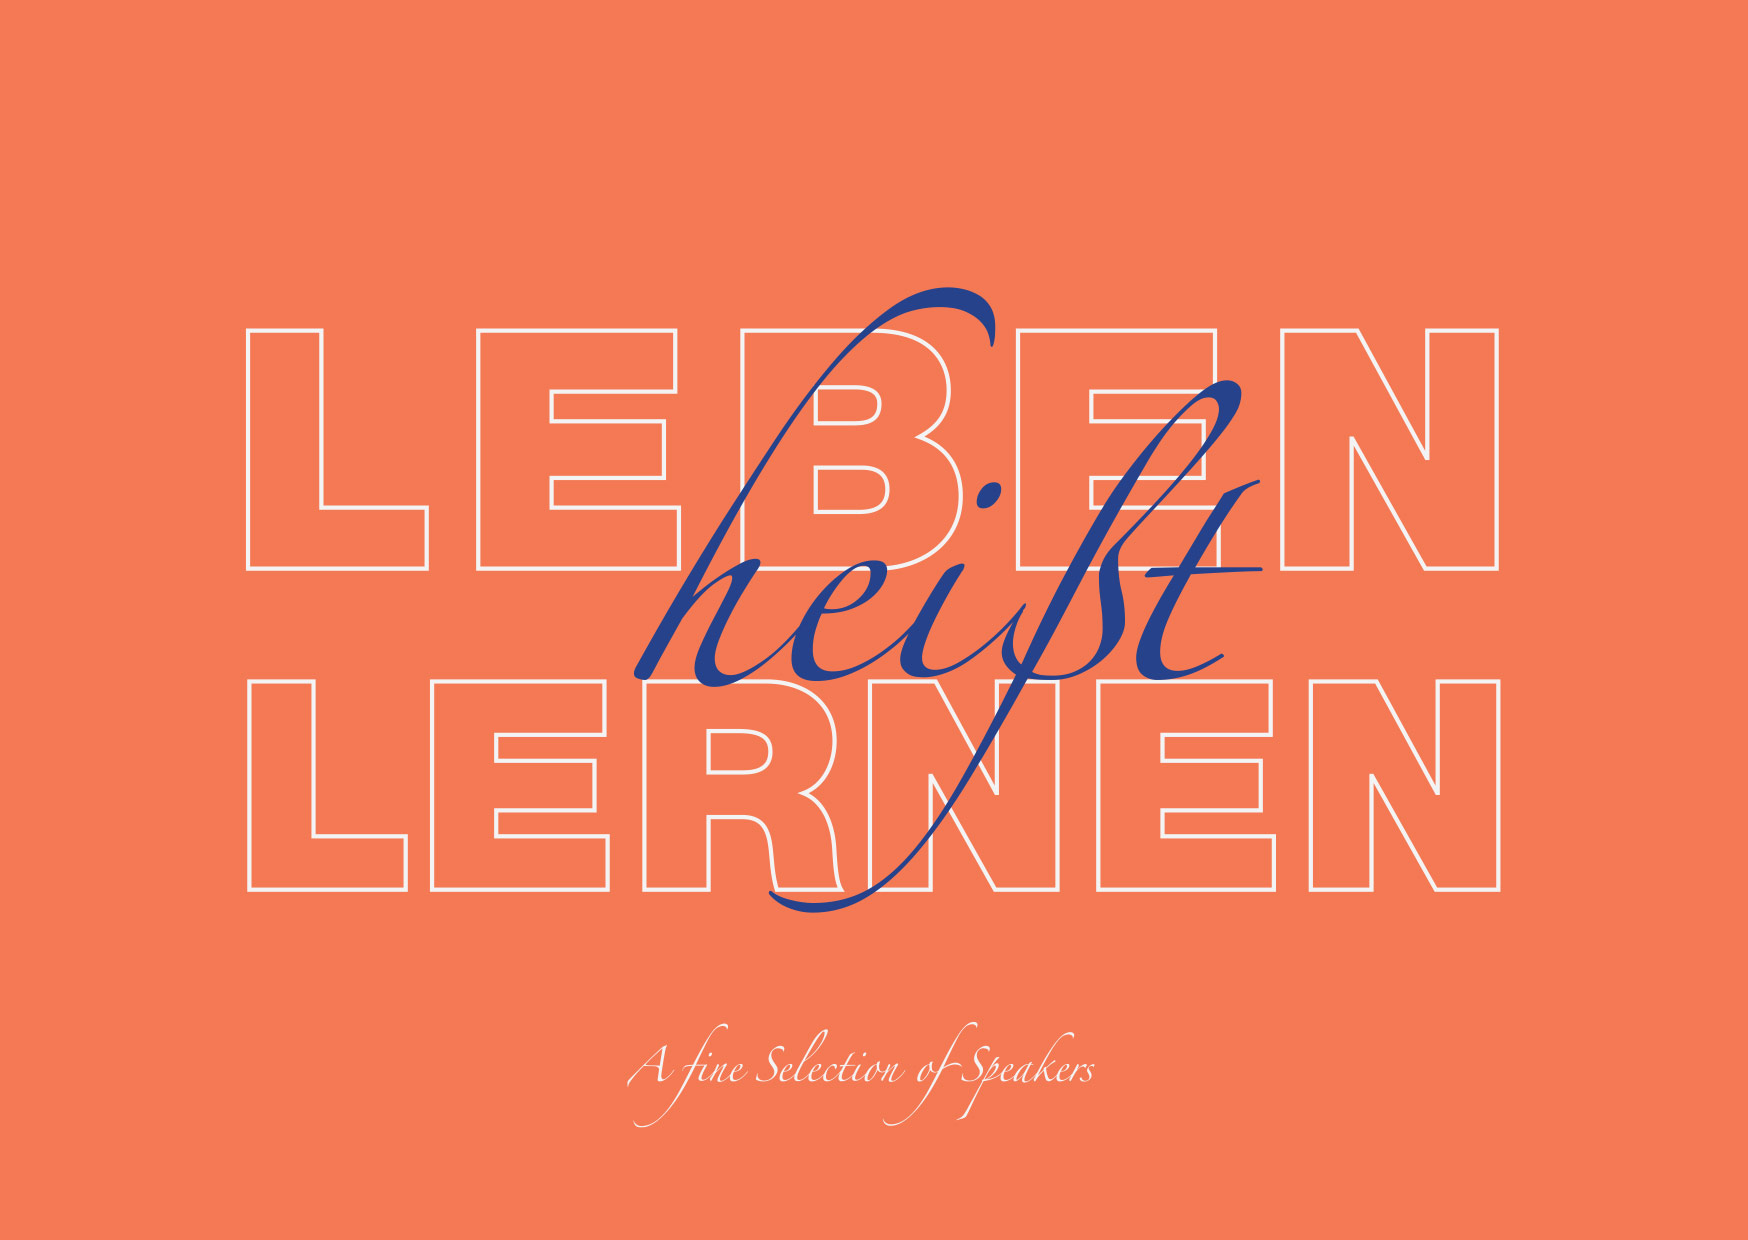 Gregor Staub: Leben heißt Lernen